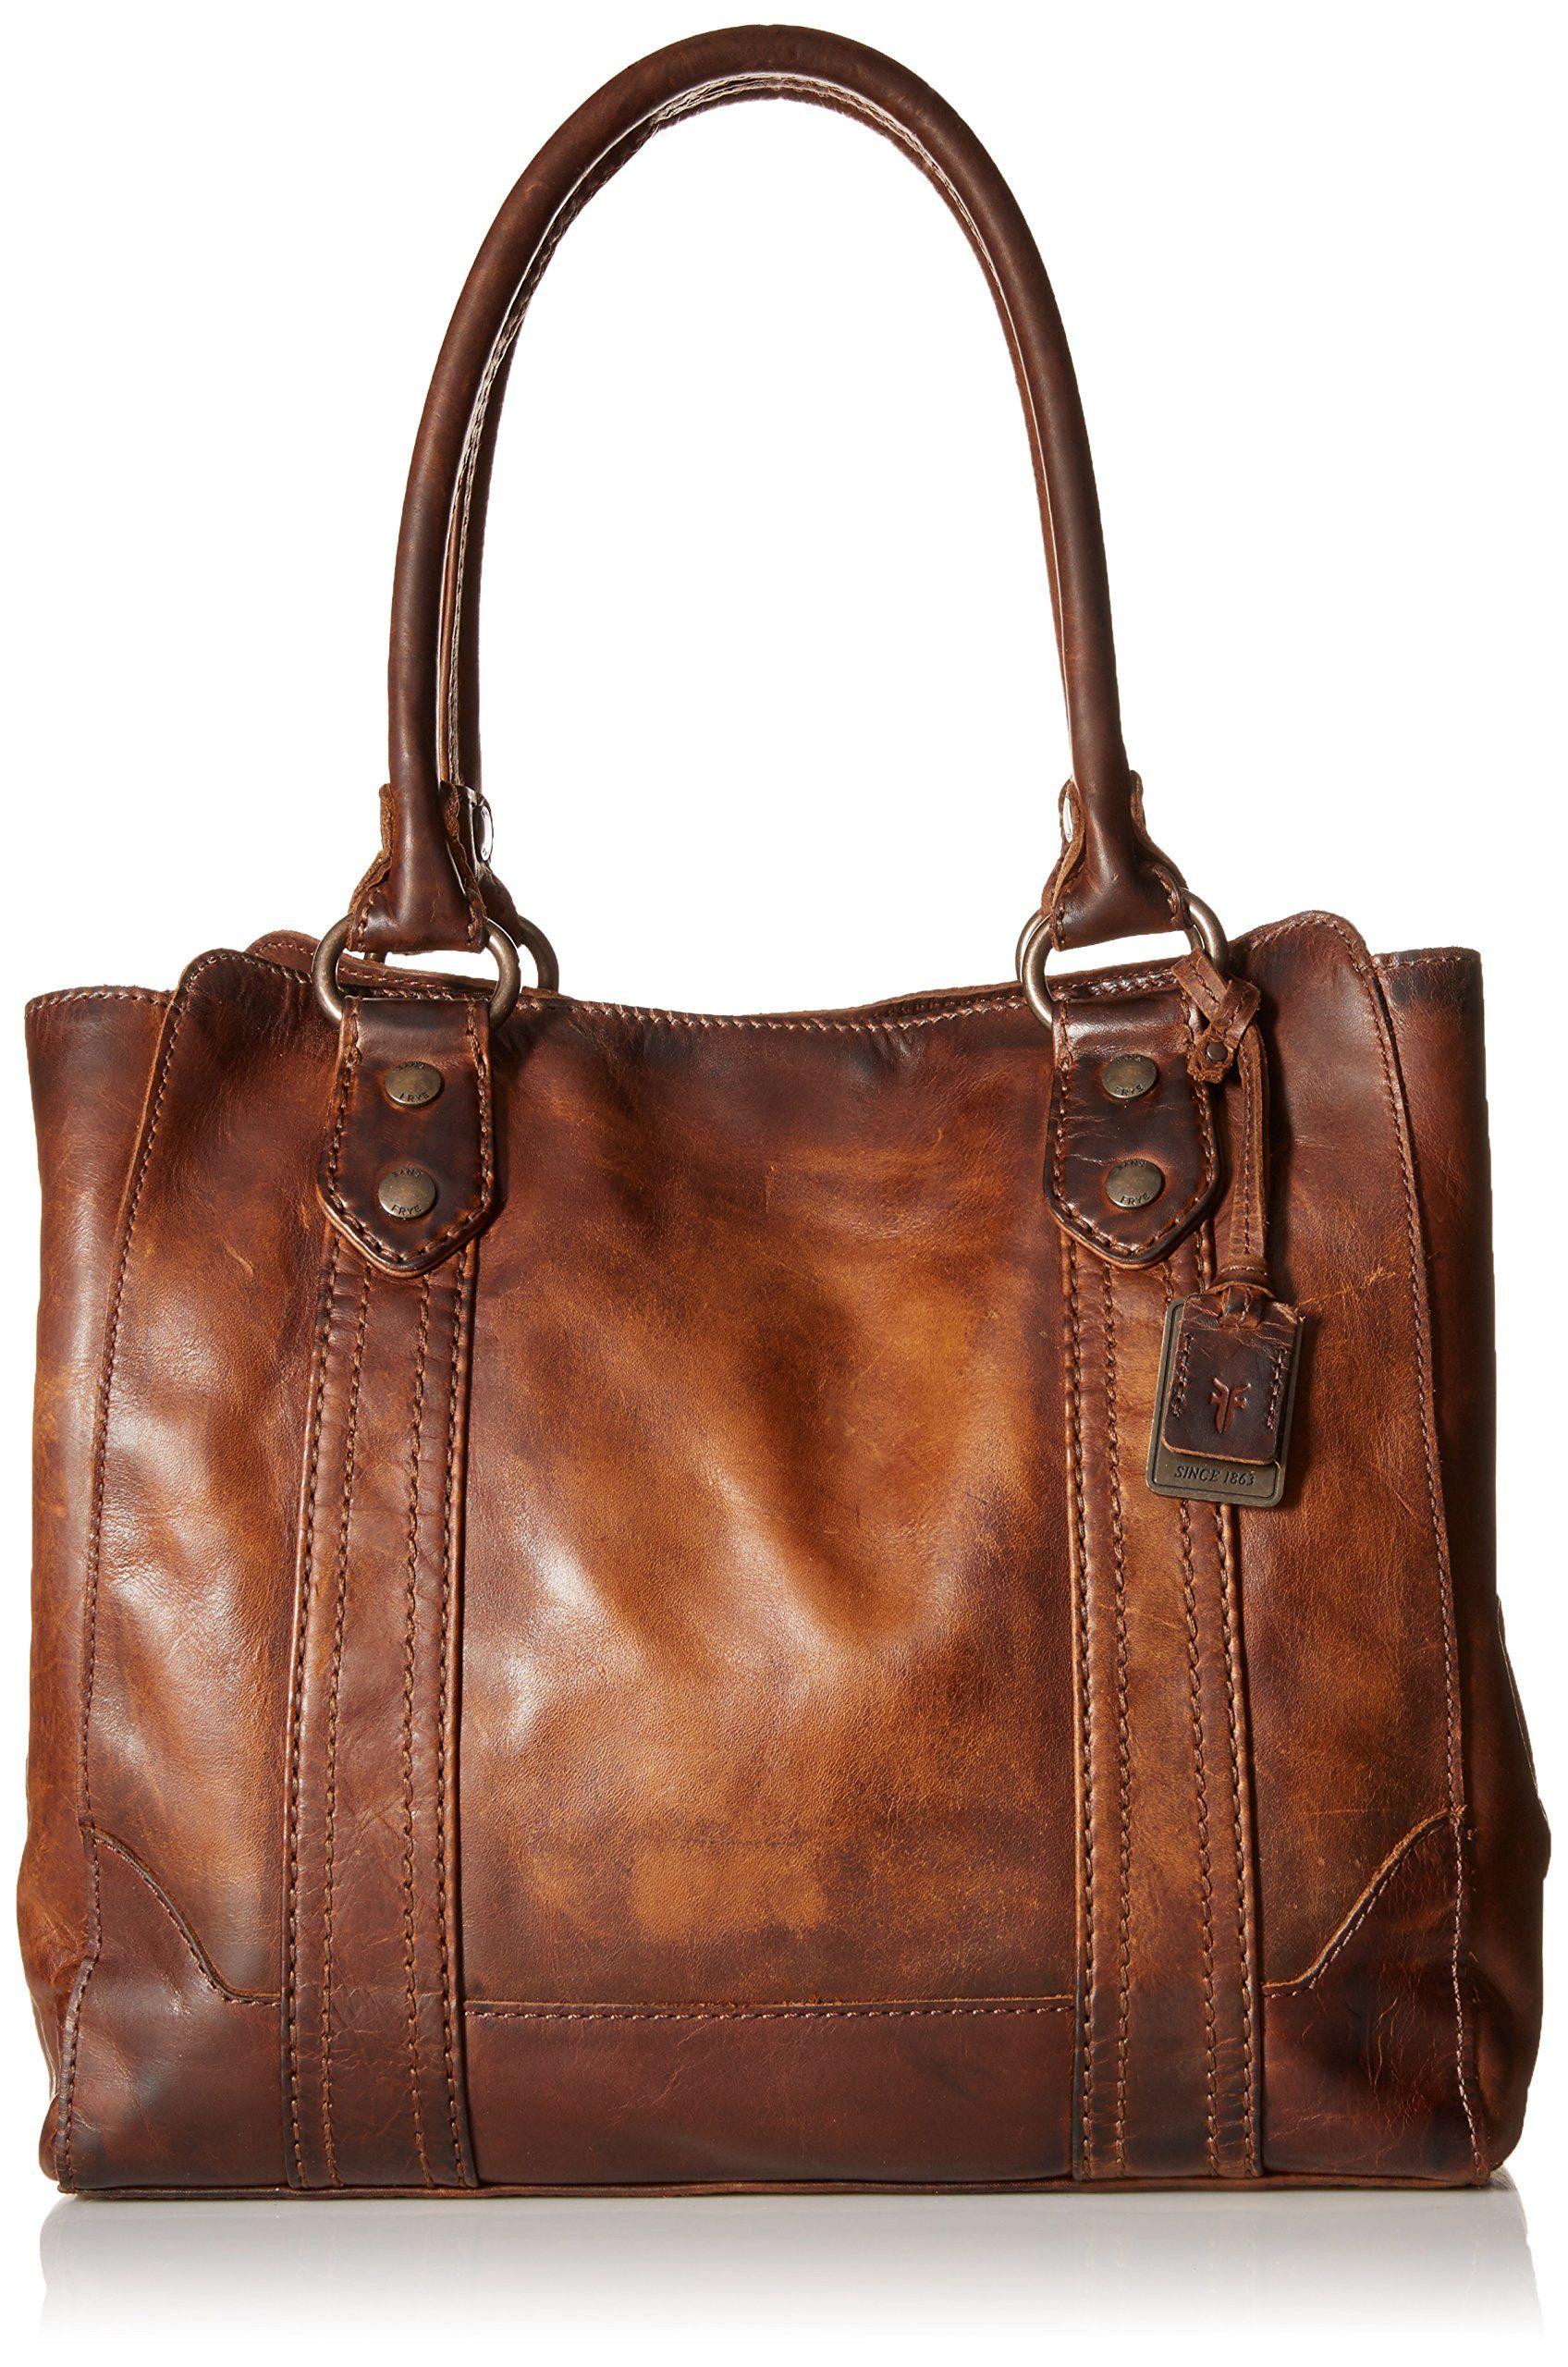 3ddc236b45d8 Beautiful Bags · Amazon.com  Frye Melissa Tote